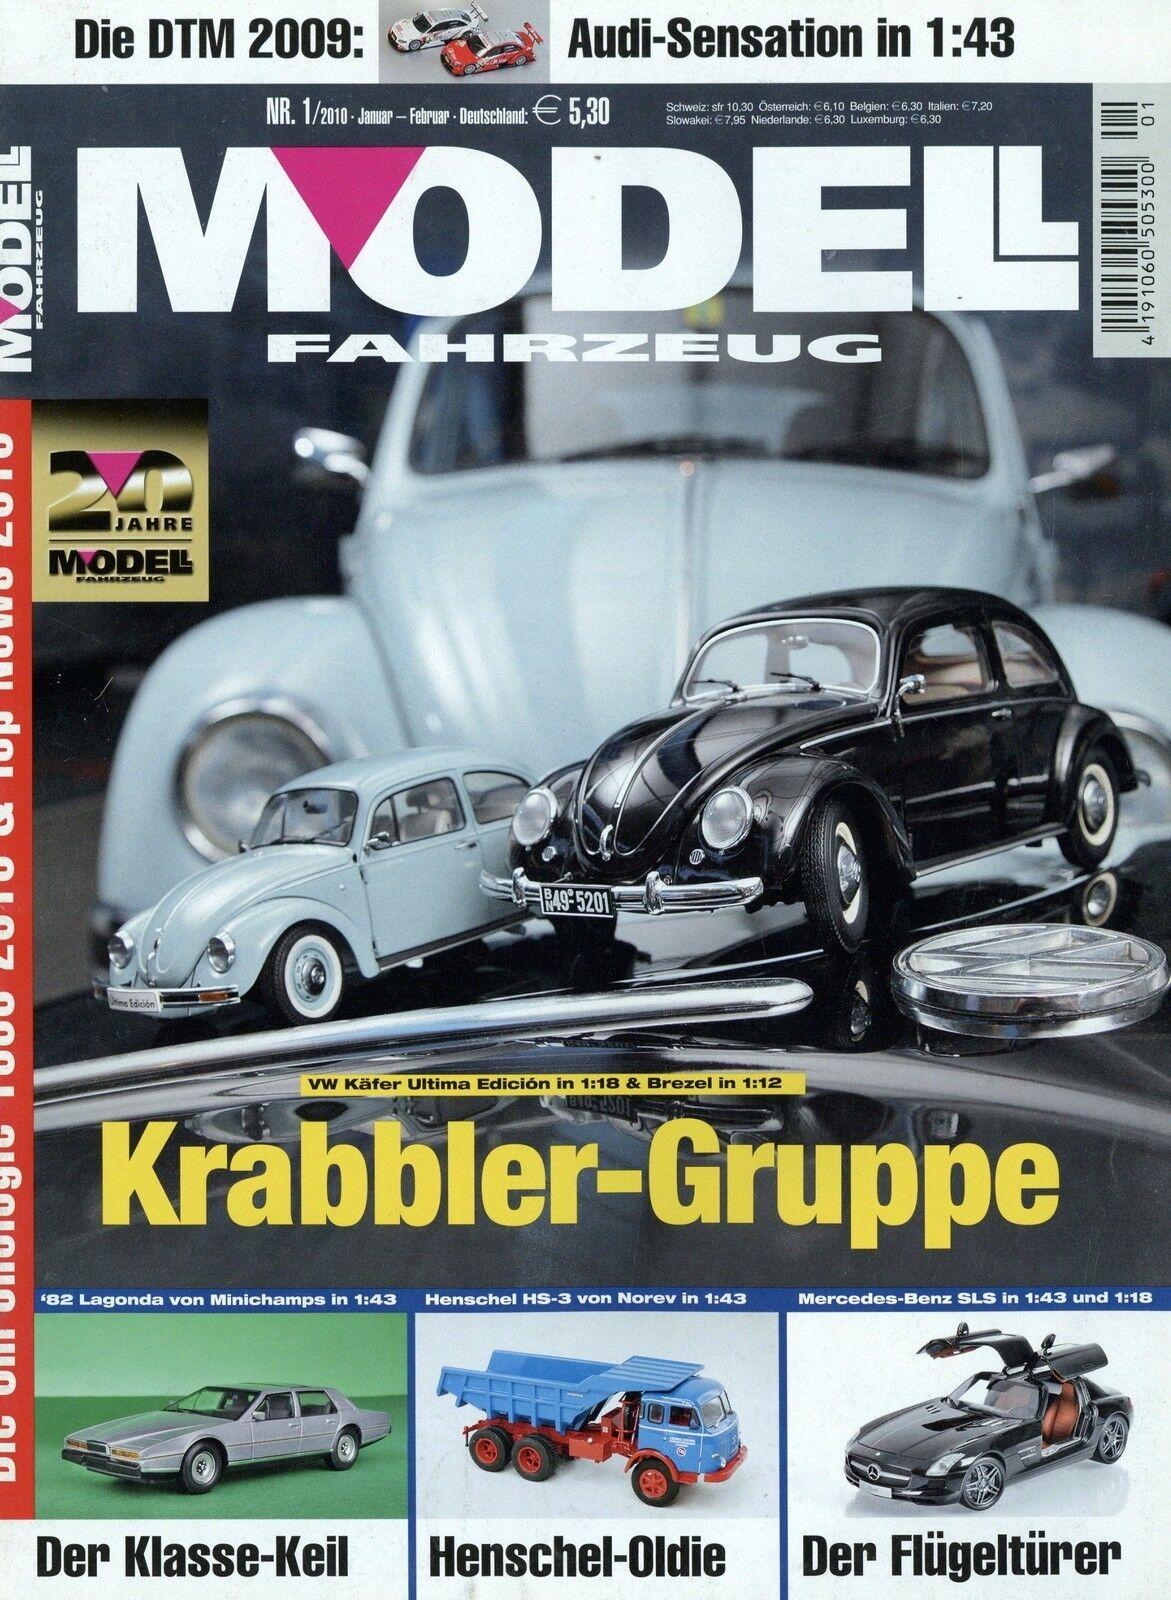 Revista modelo vehículo 1 2010 2010 2010 audi v8 DTM Citroën 2cv Fendt 9460r capitán  presentando toda la última moda de la calle